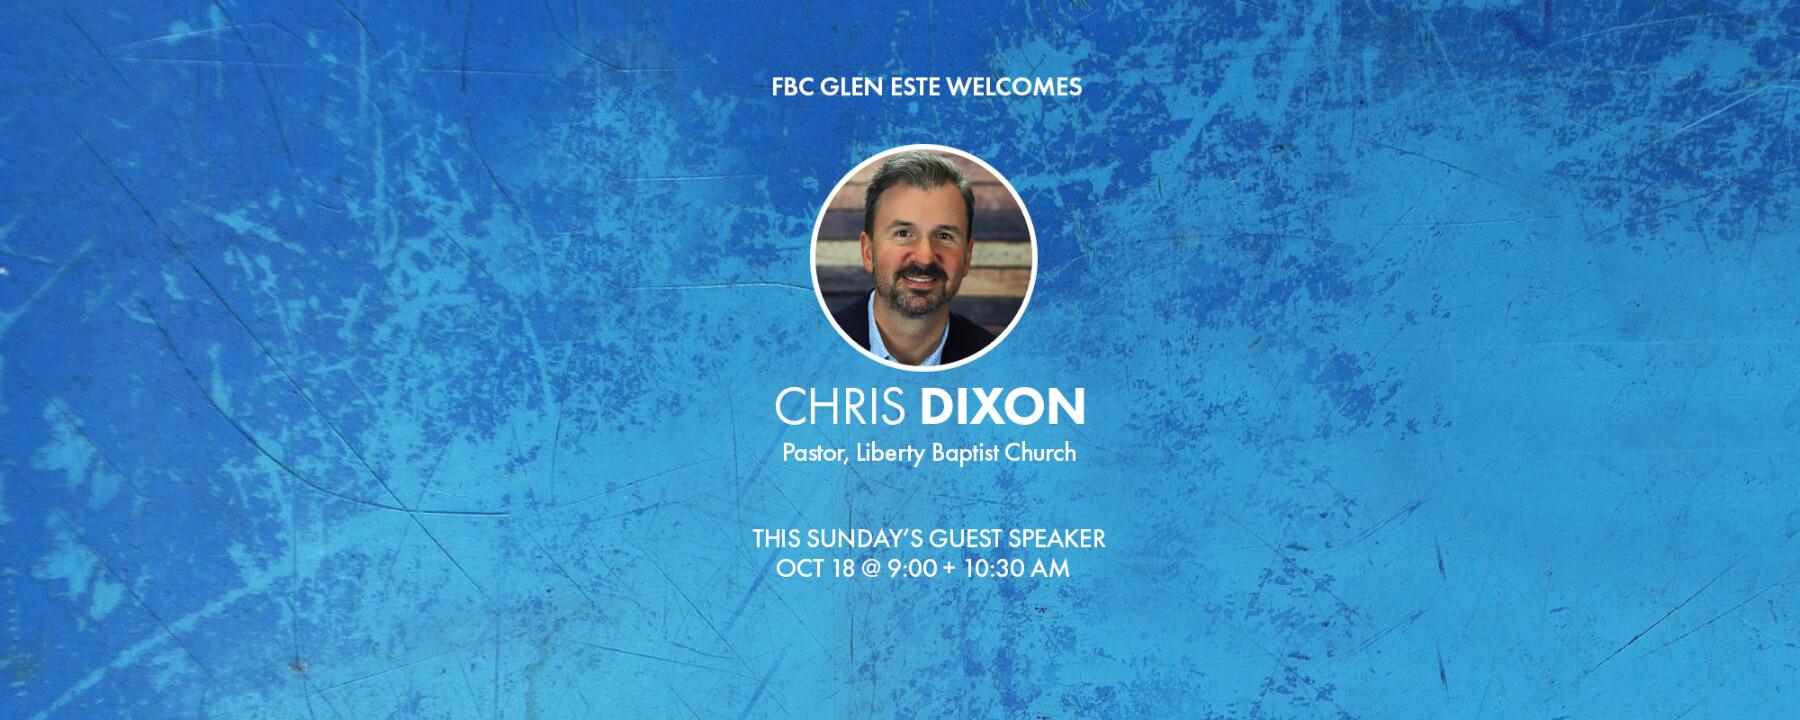 Chris Dixon - Guest Speaker